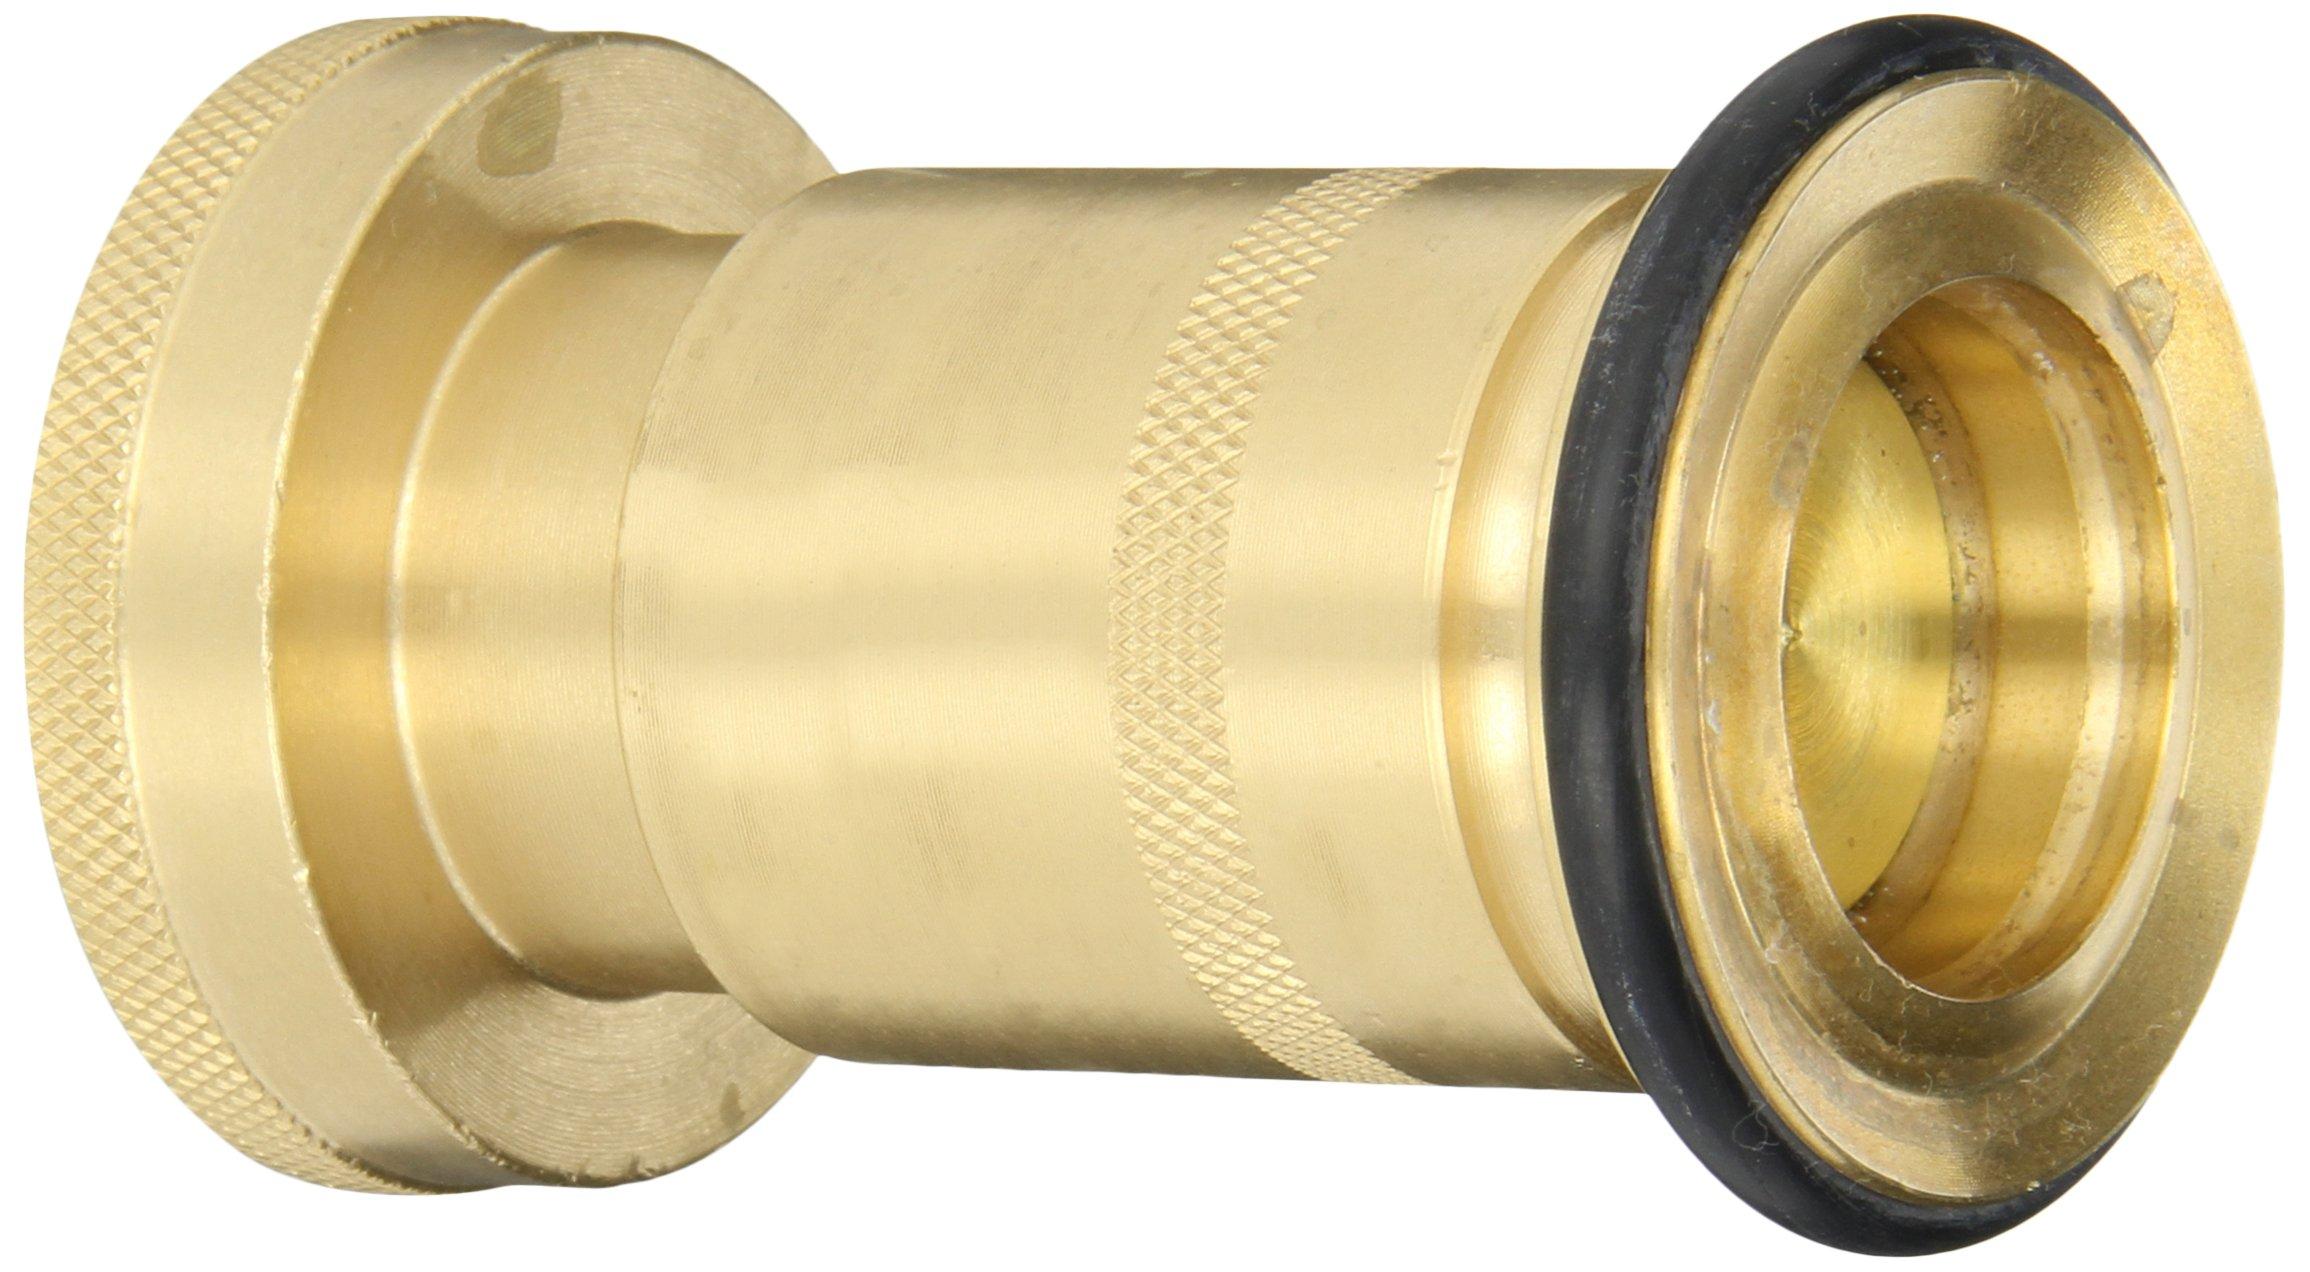 Dixon Valve BFN150NST Brass Fire Equipment, Industrial Fog Nozzle, 1-1/2'' NST (NH) Female, 100 psi Pressure